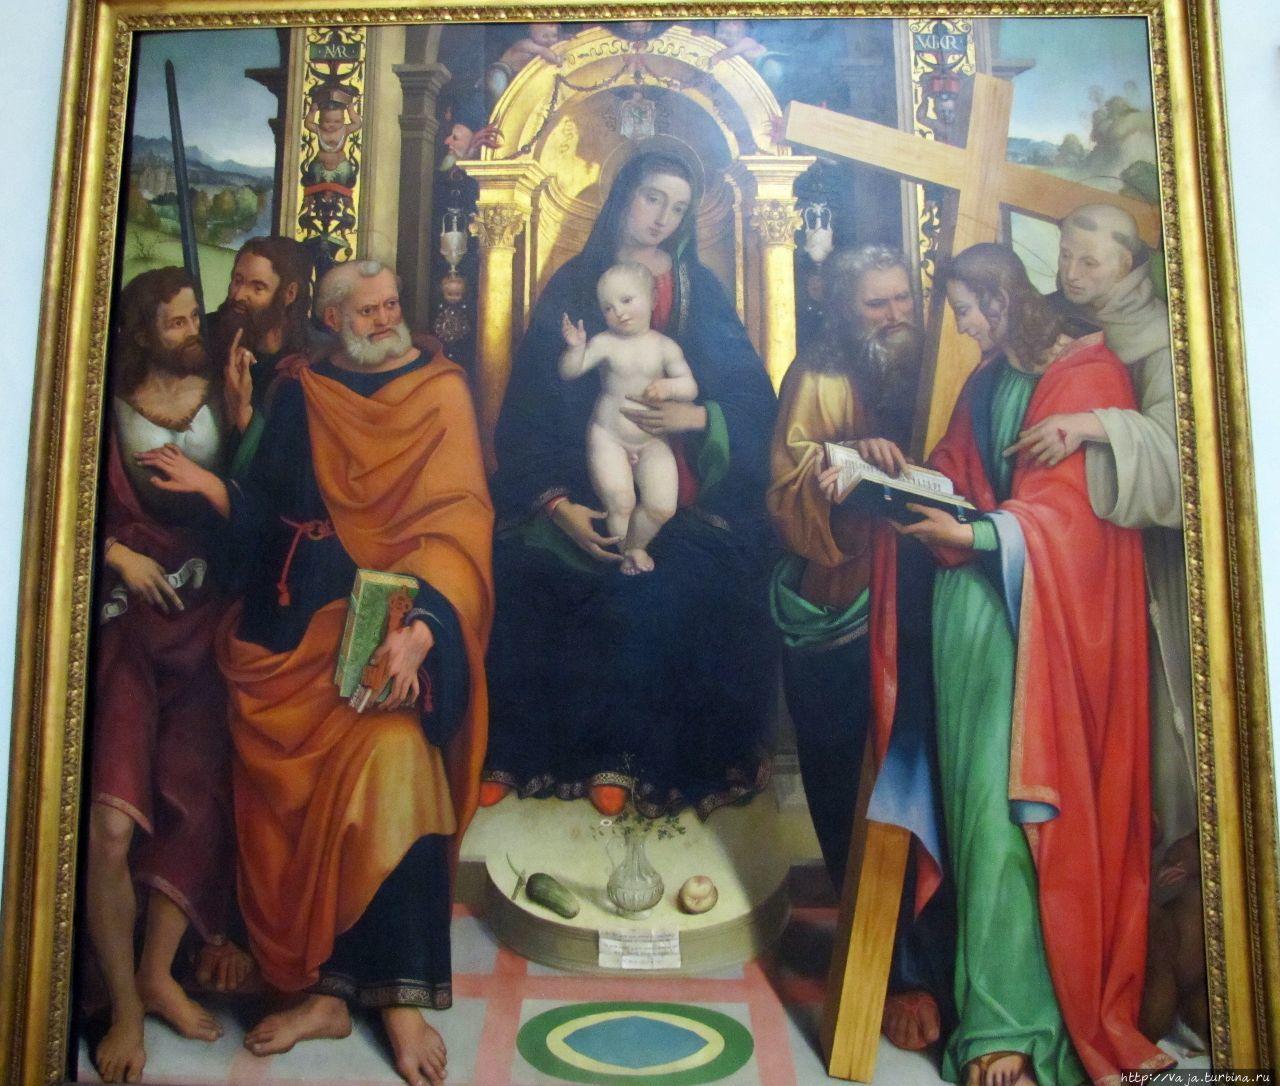 Мадонна и святые Рим, Италия